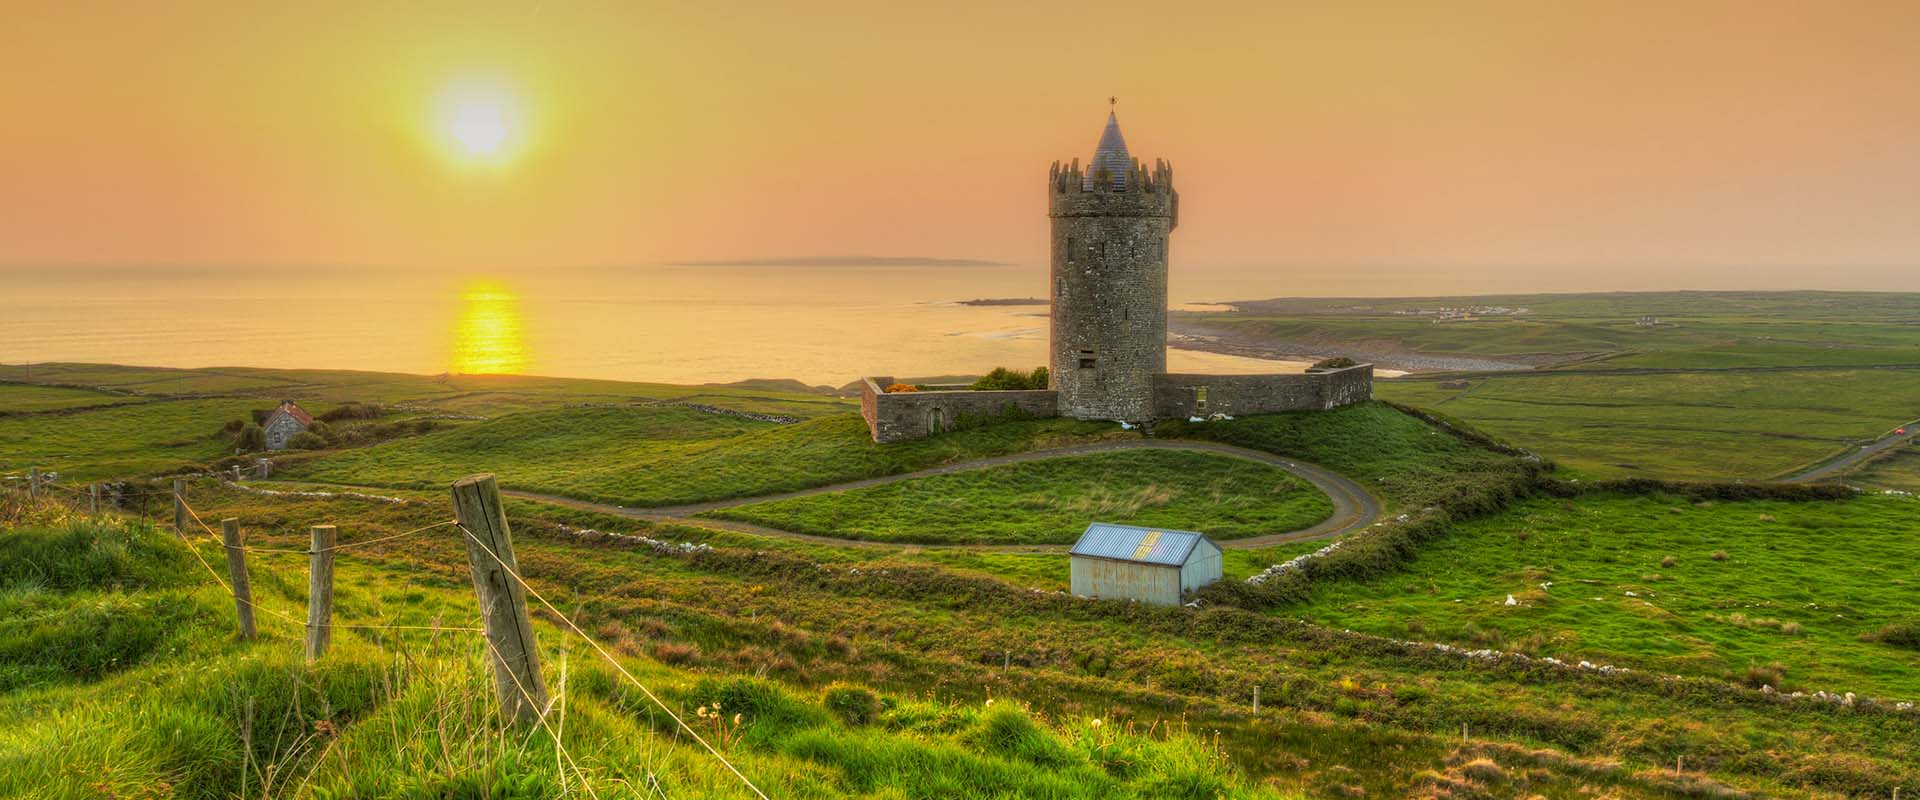 Ireland Bank Holidays 2018 Publicholidays Ie